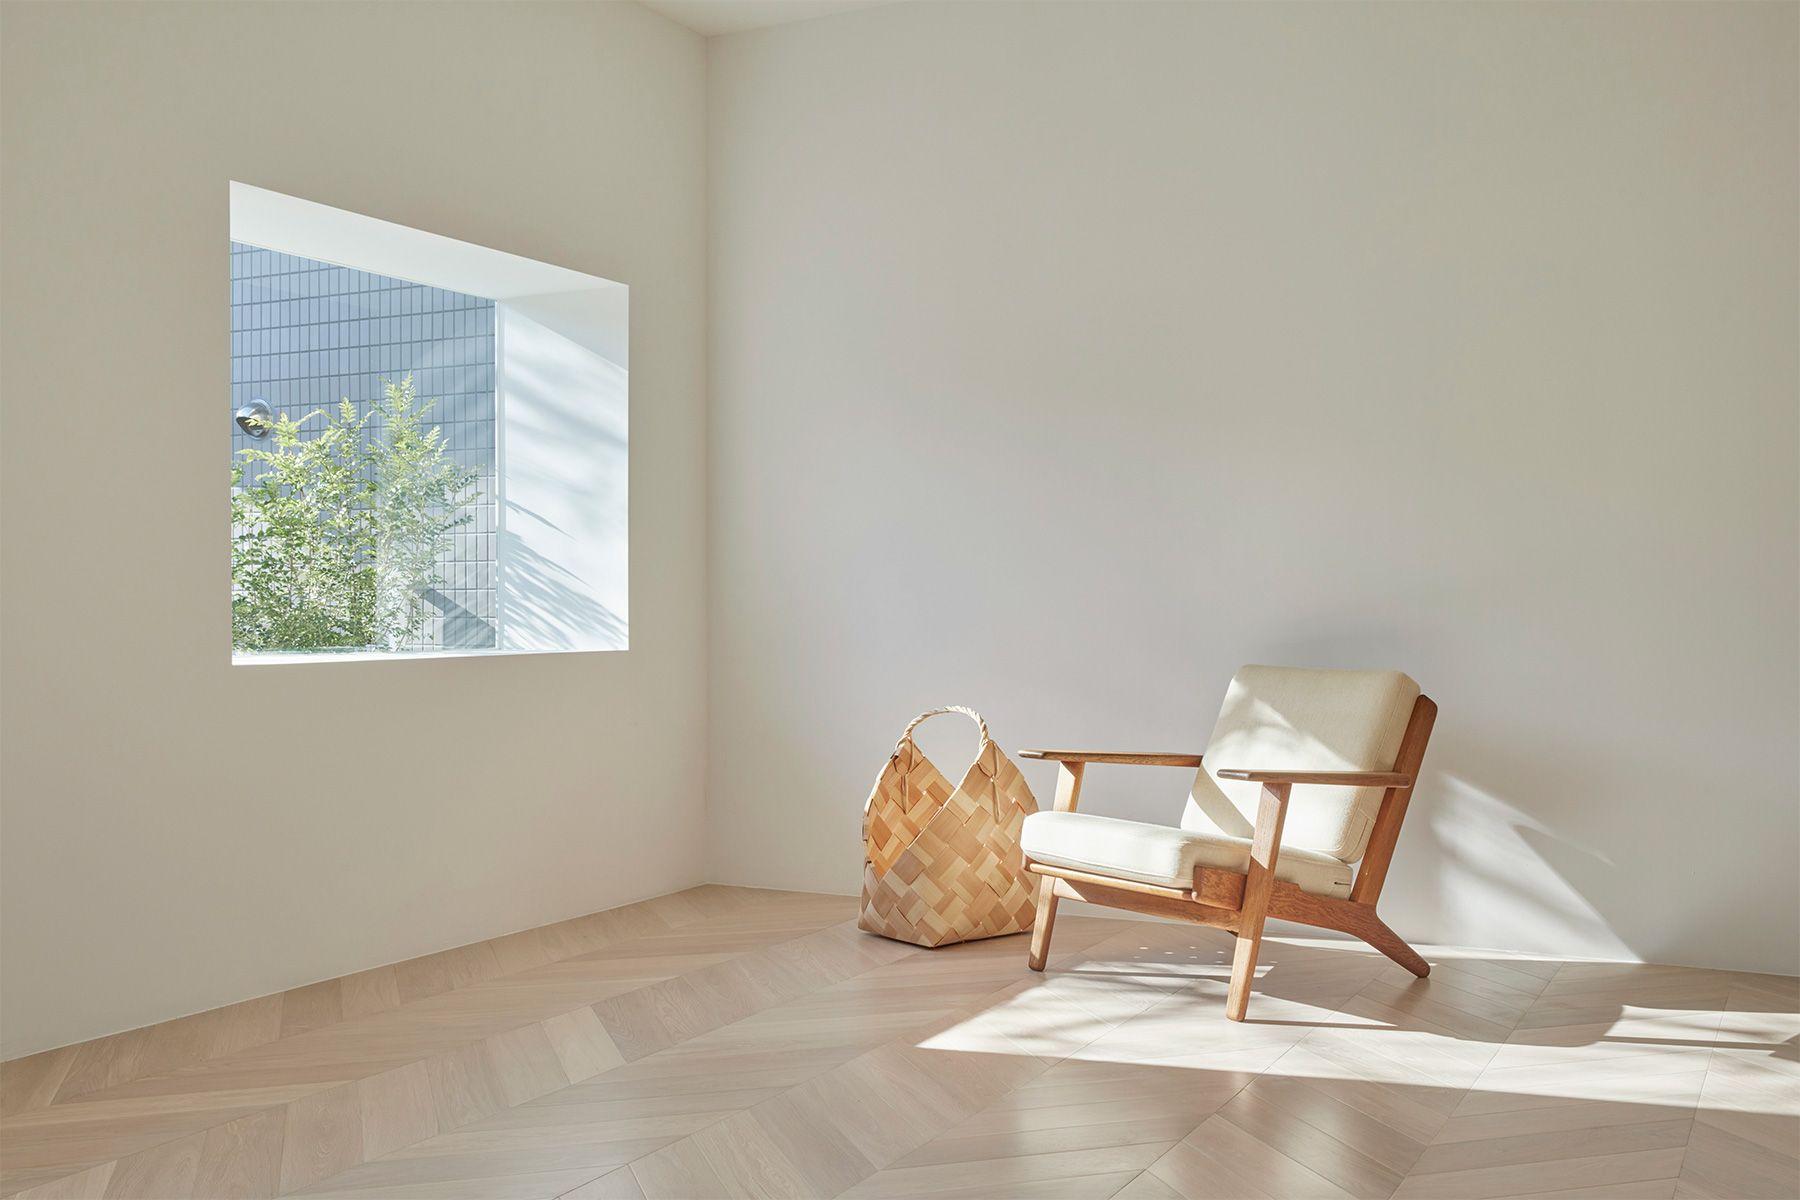 Haku Studio / THE HOUSE (ハクスタジオ)明るい空間の2階